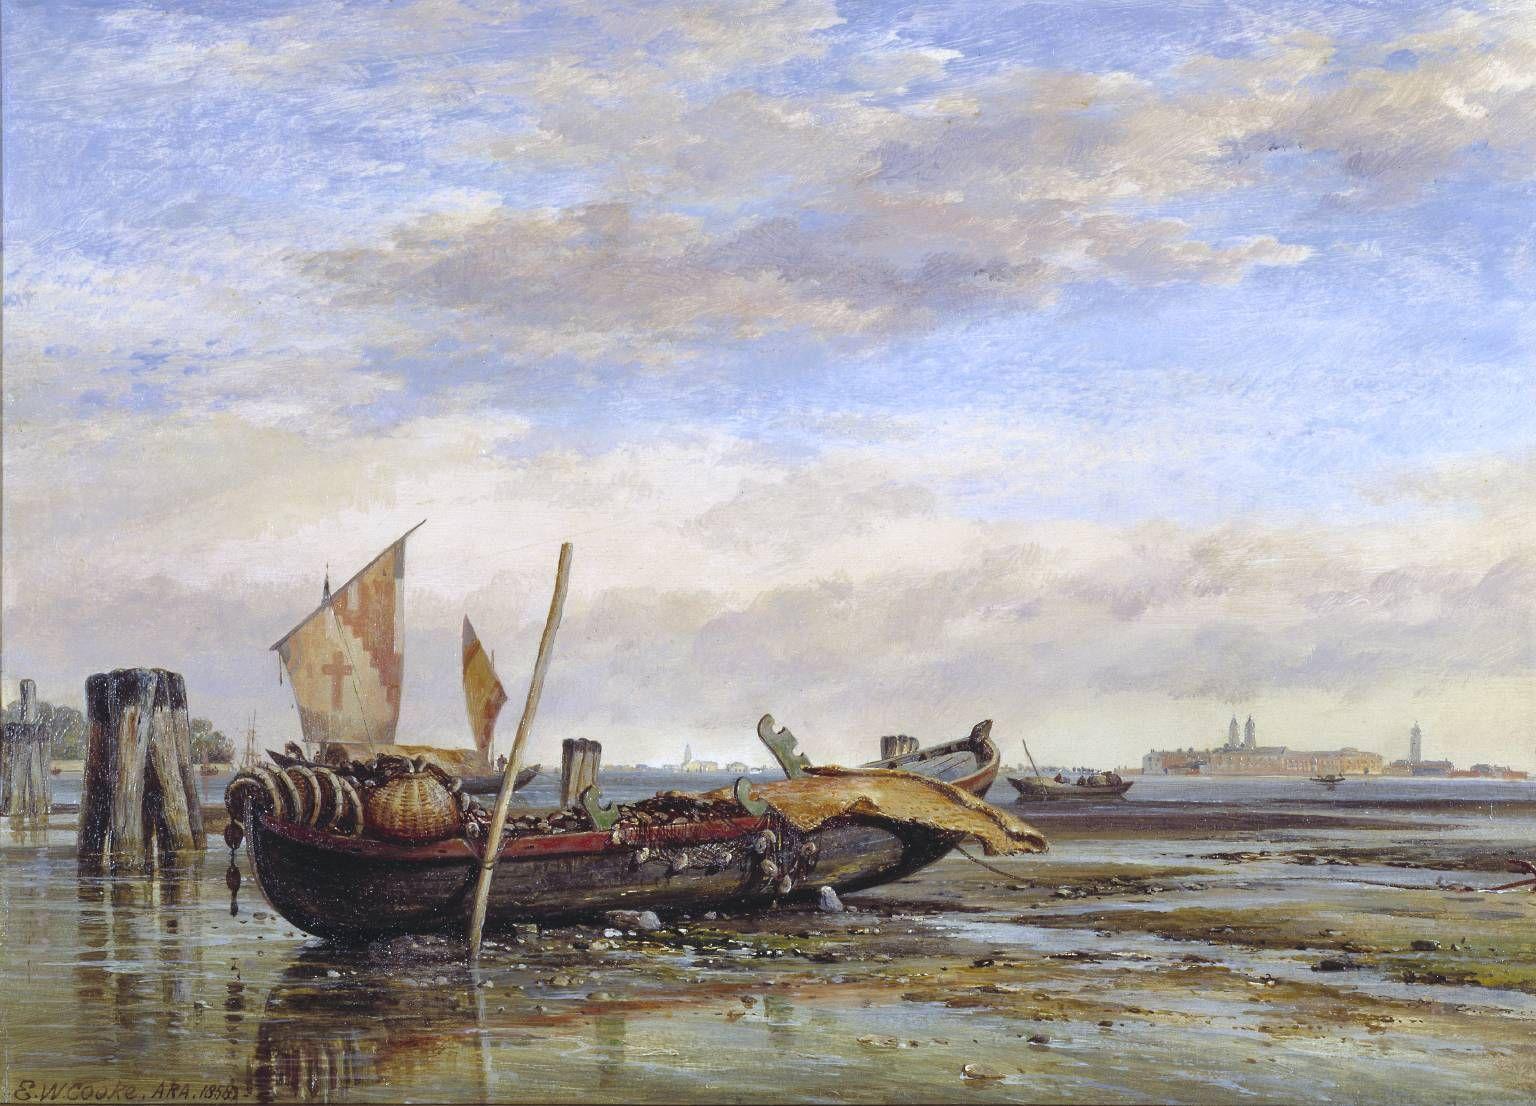 Edward William Cooke, 'Boat, near Venice' 1858